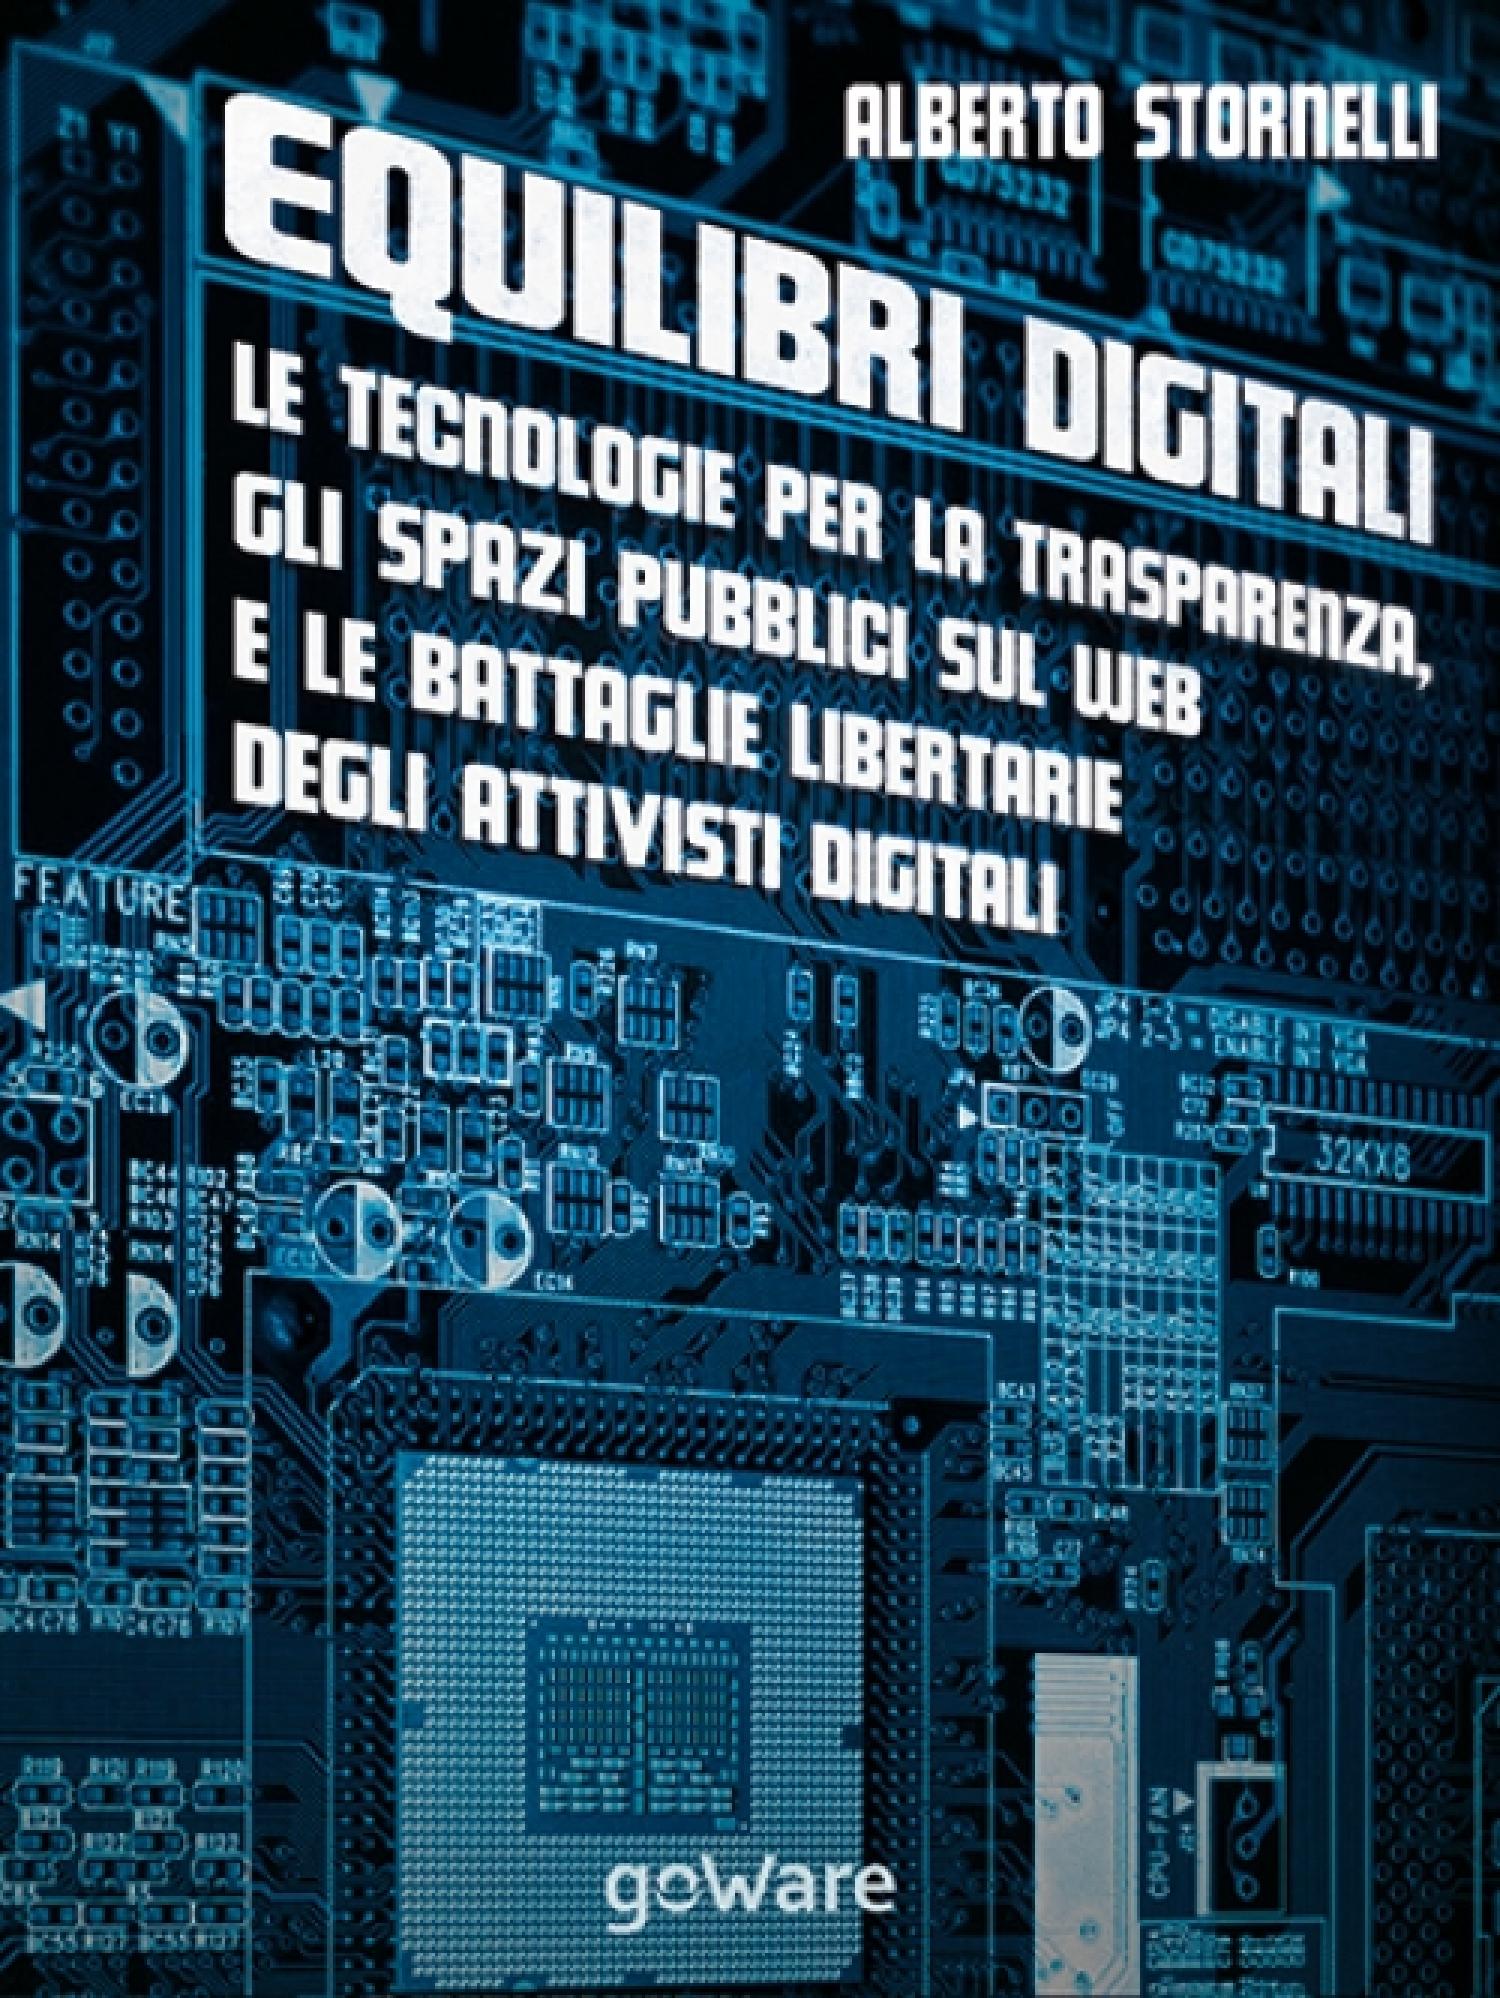 stornelli_equilibri-digitali_400.jpg